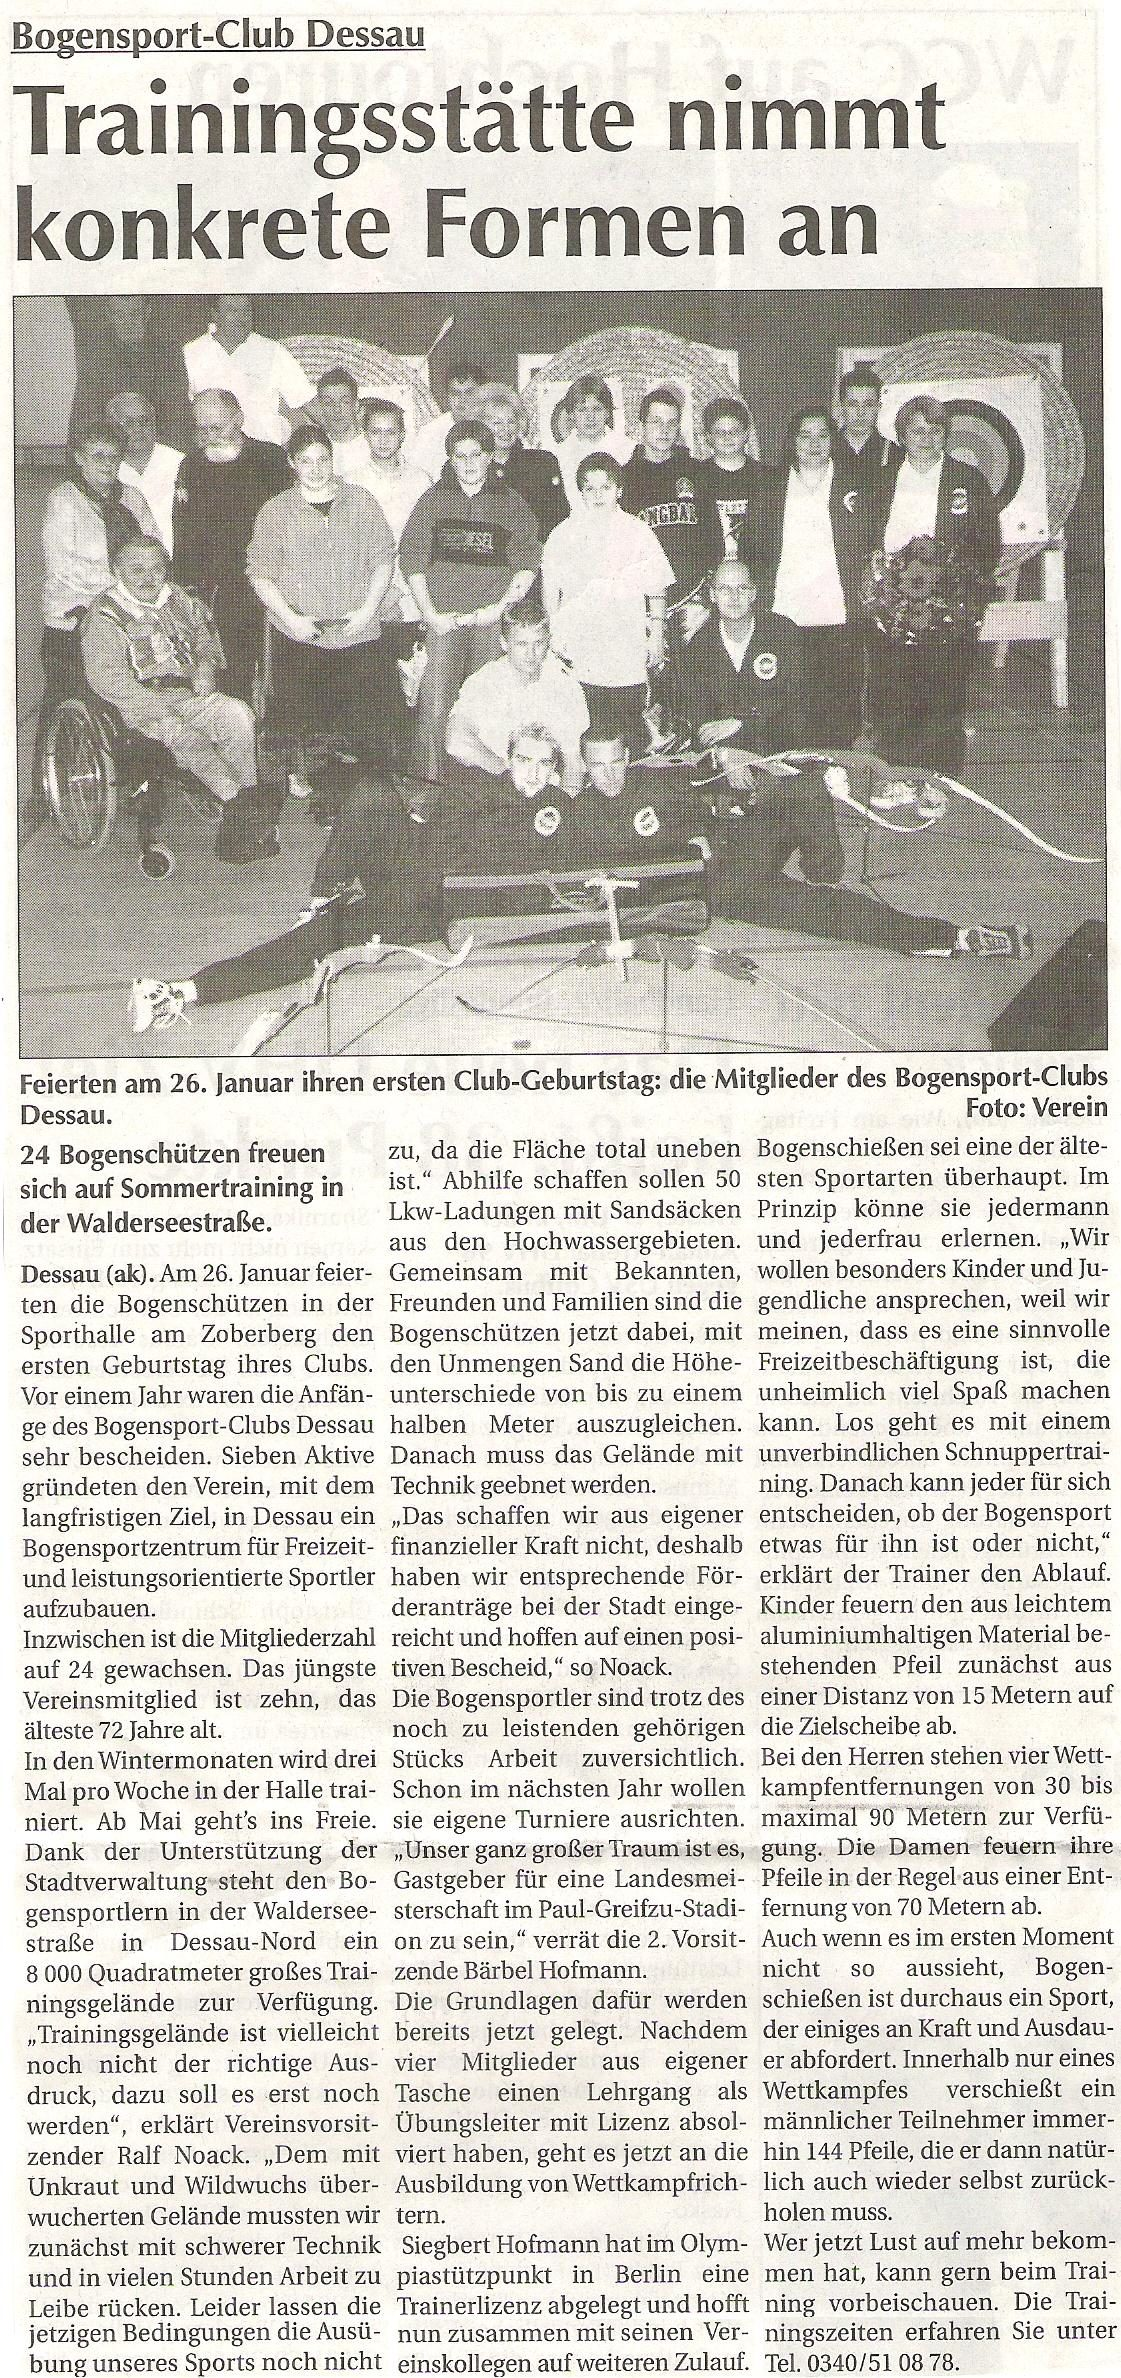 1. Geburtstag unseres Clubs – Super Sonntag (Februar 2003)